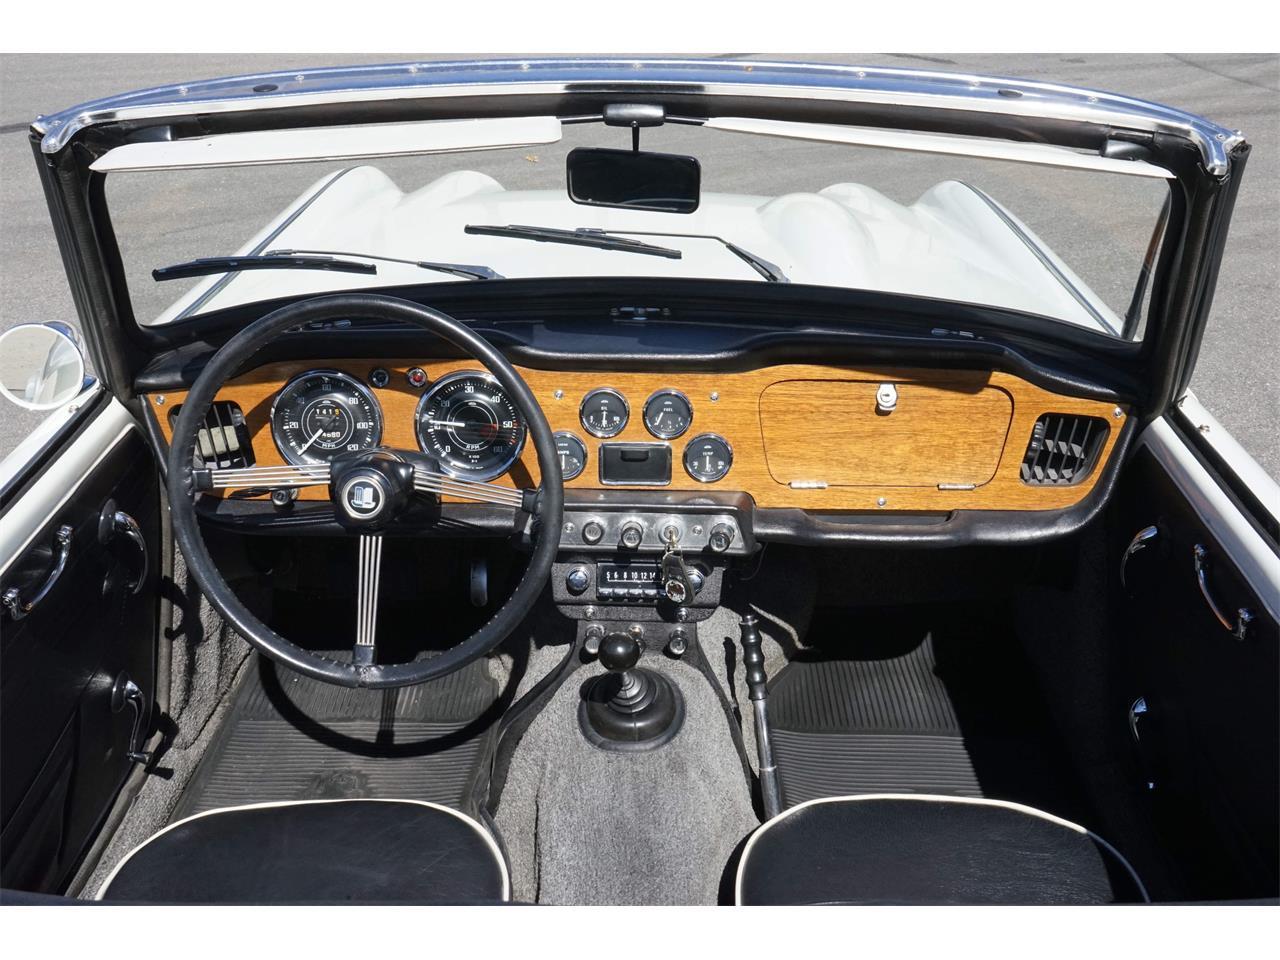 1963 Triumph TR4 (CC-1337161) for sale in Boise, Idaho